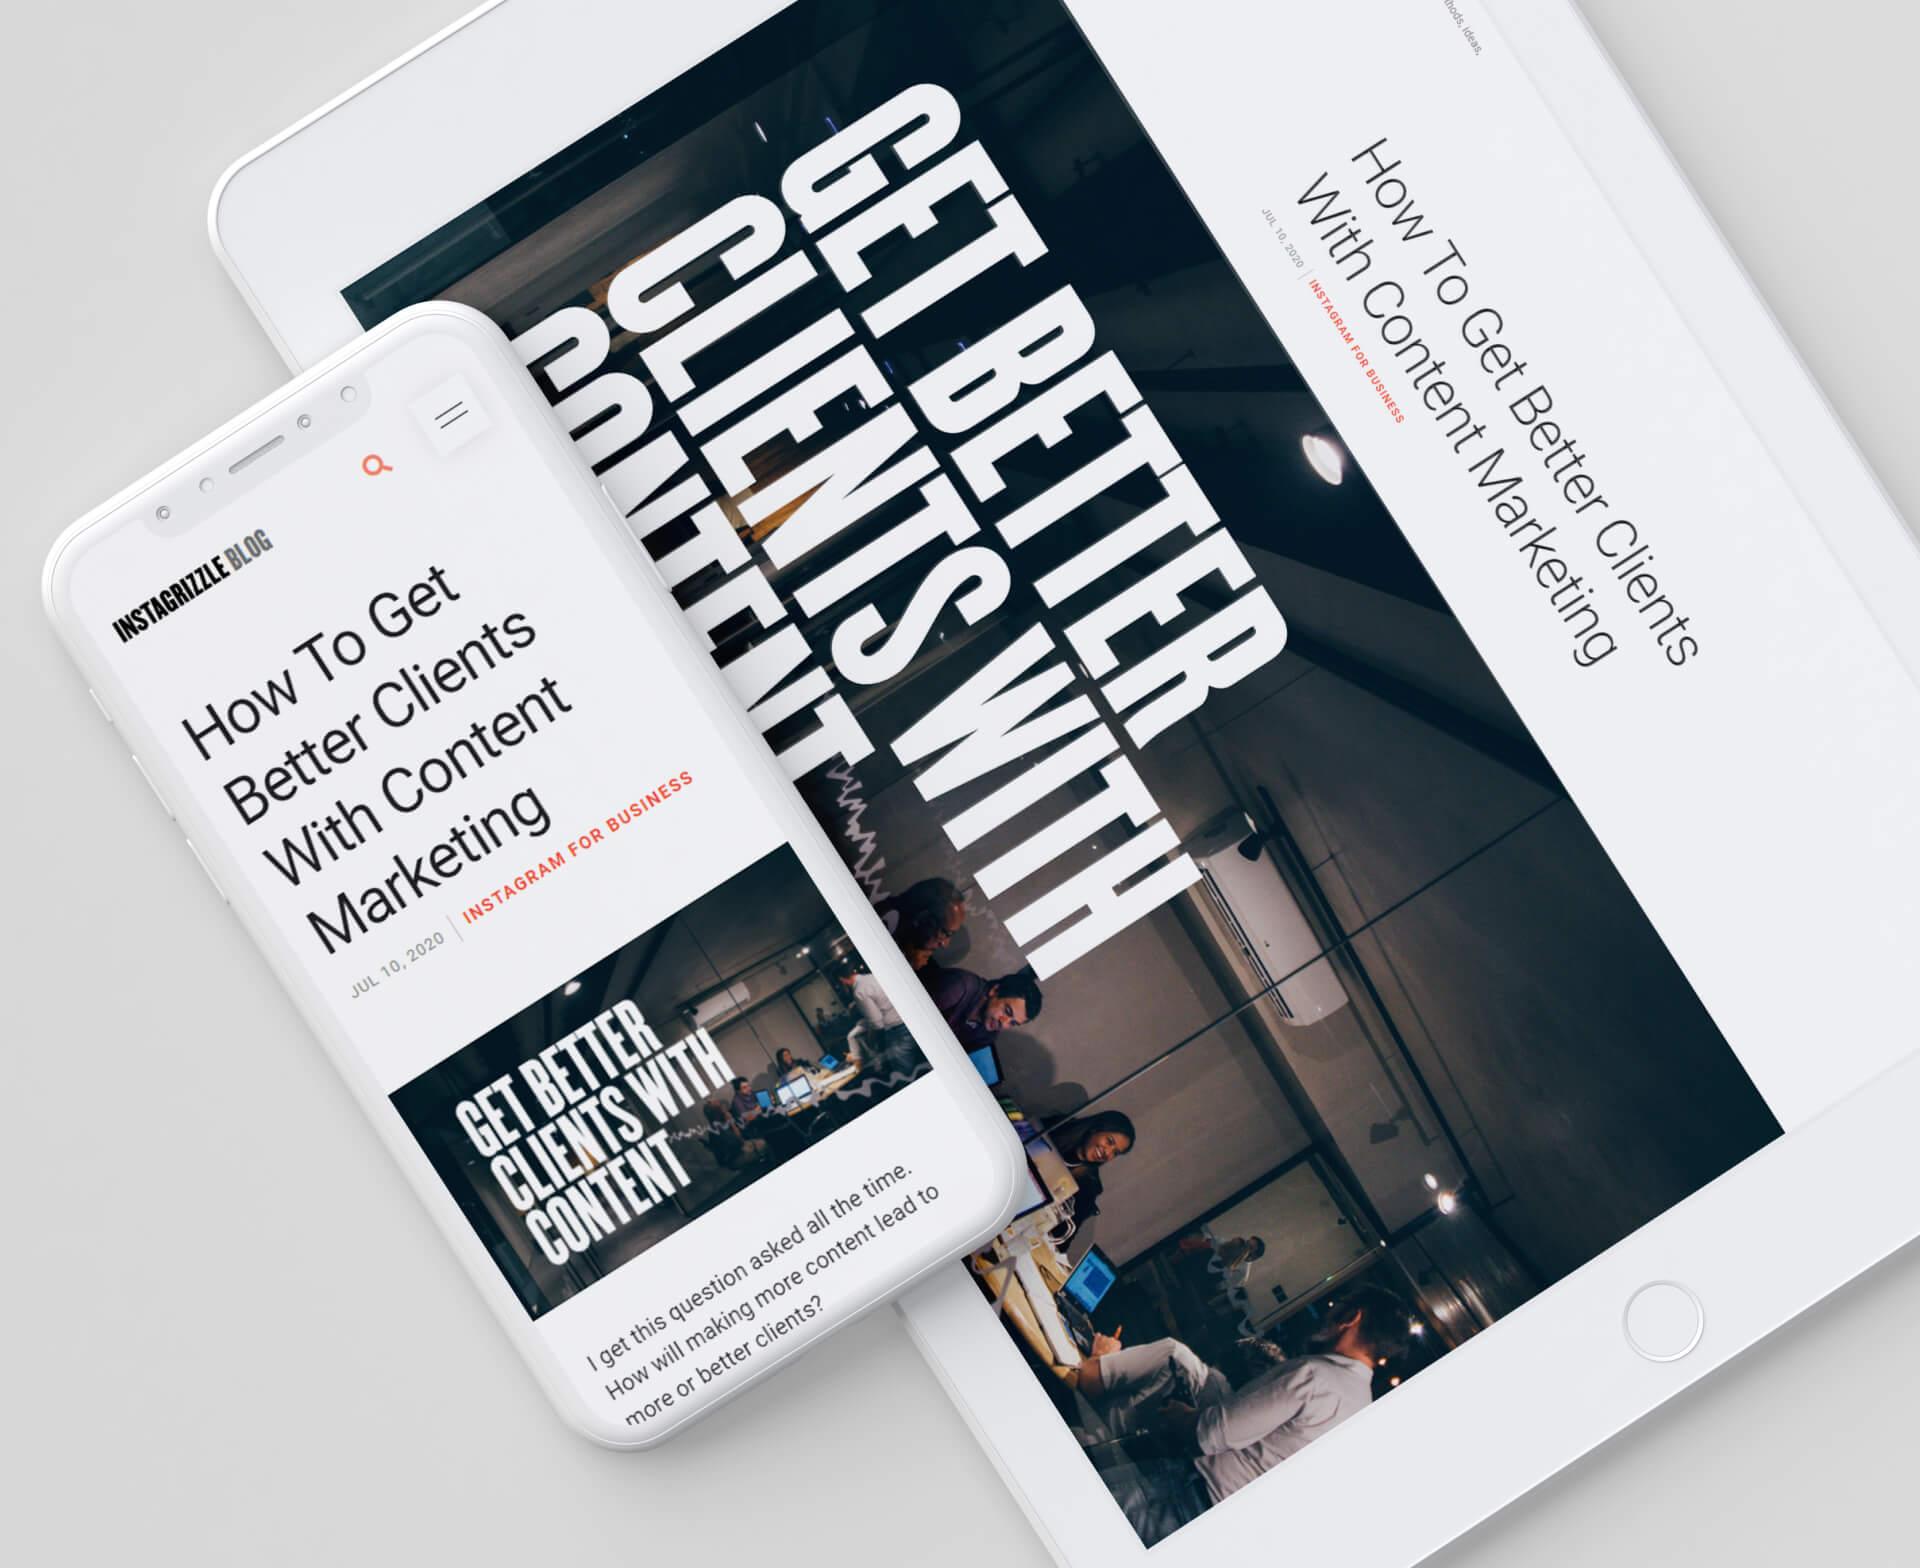 david's blog displayed inside white ipad and iphone